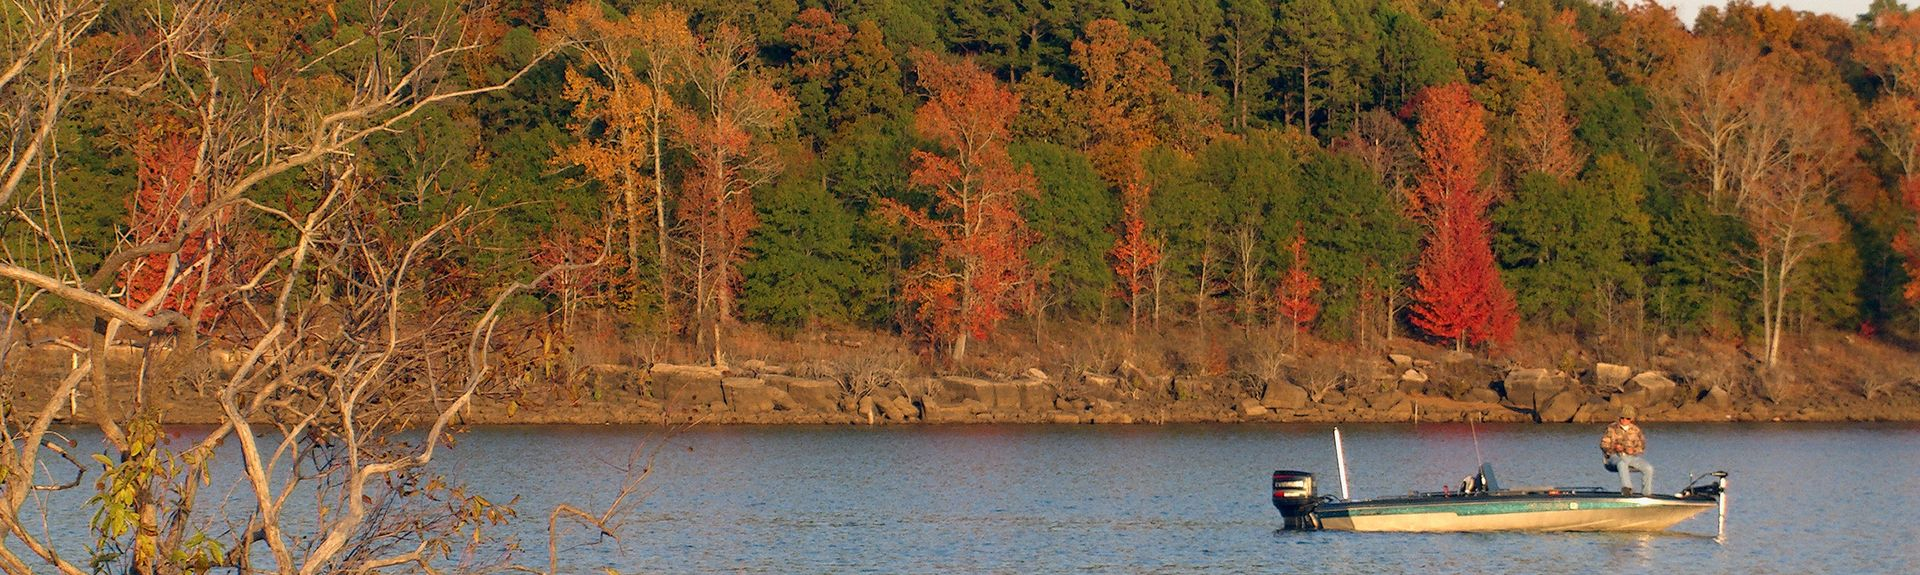 Greers Ferry Lake, Arkansas, USA